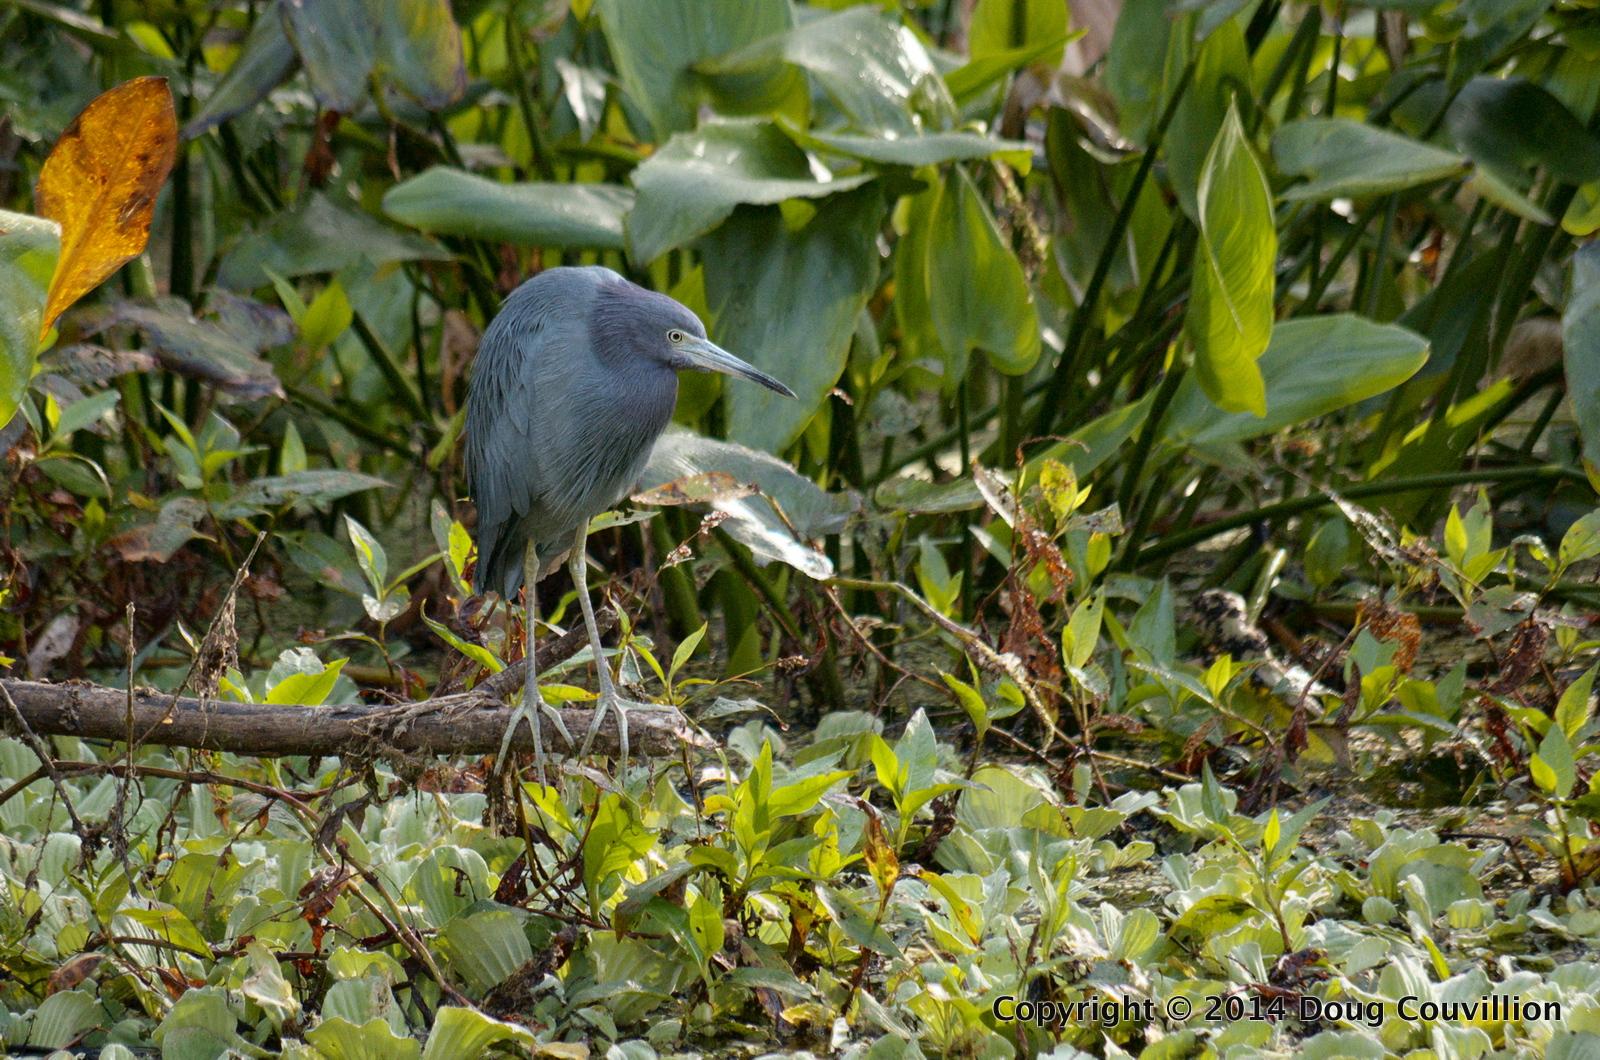 Photograph of a Little Blue Heron at Corkscrew Swamp Sanctuary near Naples, Florida